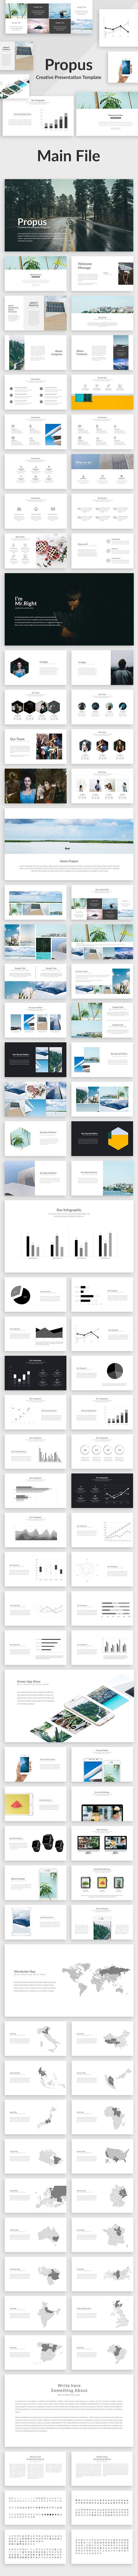 Propus - Creative Powerpoint Template - Creative PowerPoint Templates